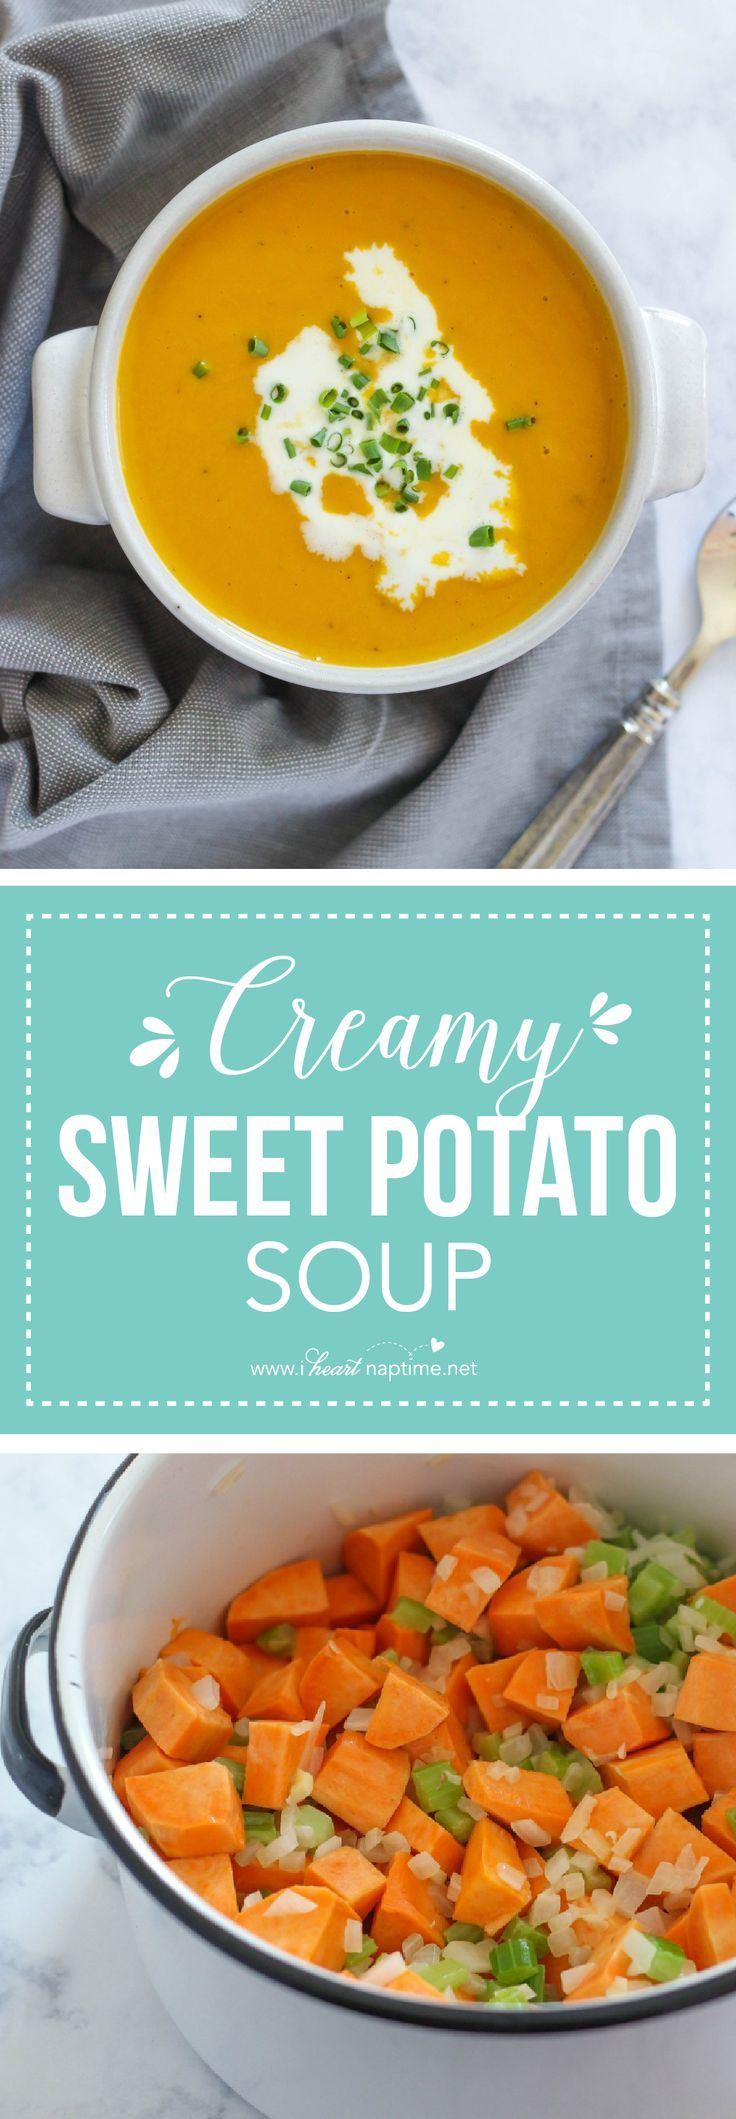 131 best Soups on! images on Pinterest | Soups, Vegetarian recipes ...